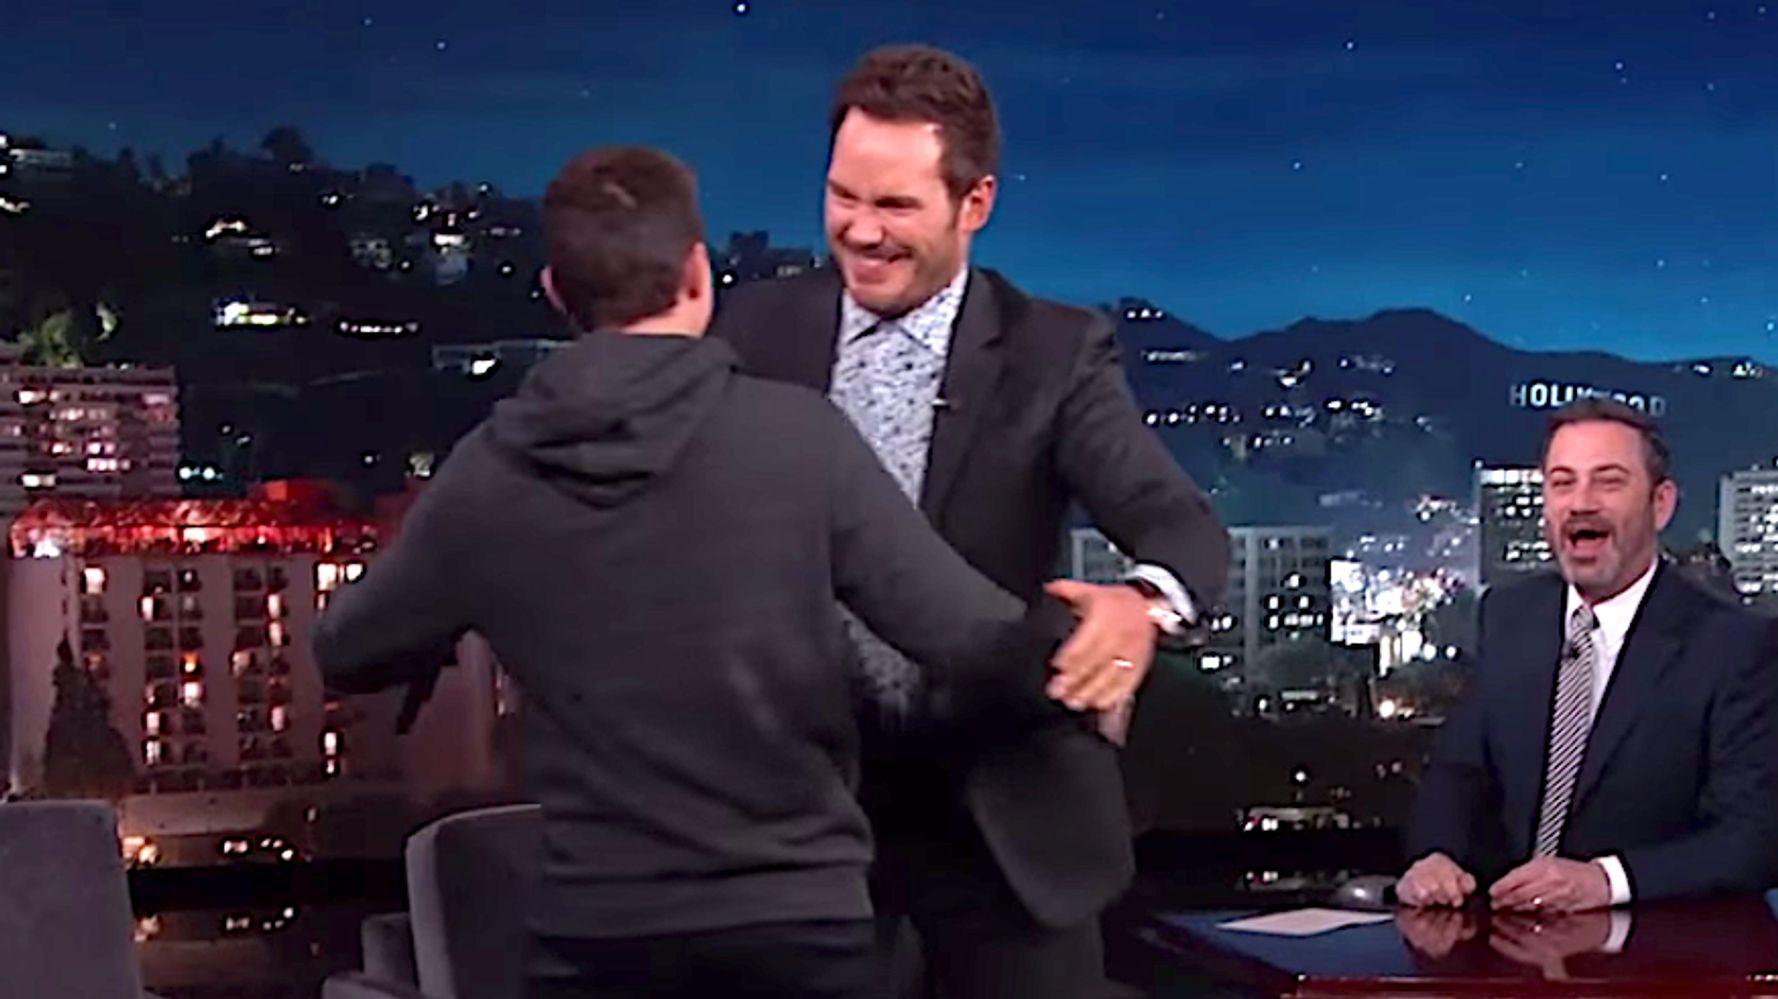 Chris Pratt Burns Tom Holland In Audience Q&A On 'Jimmy Kimmel'